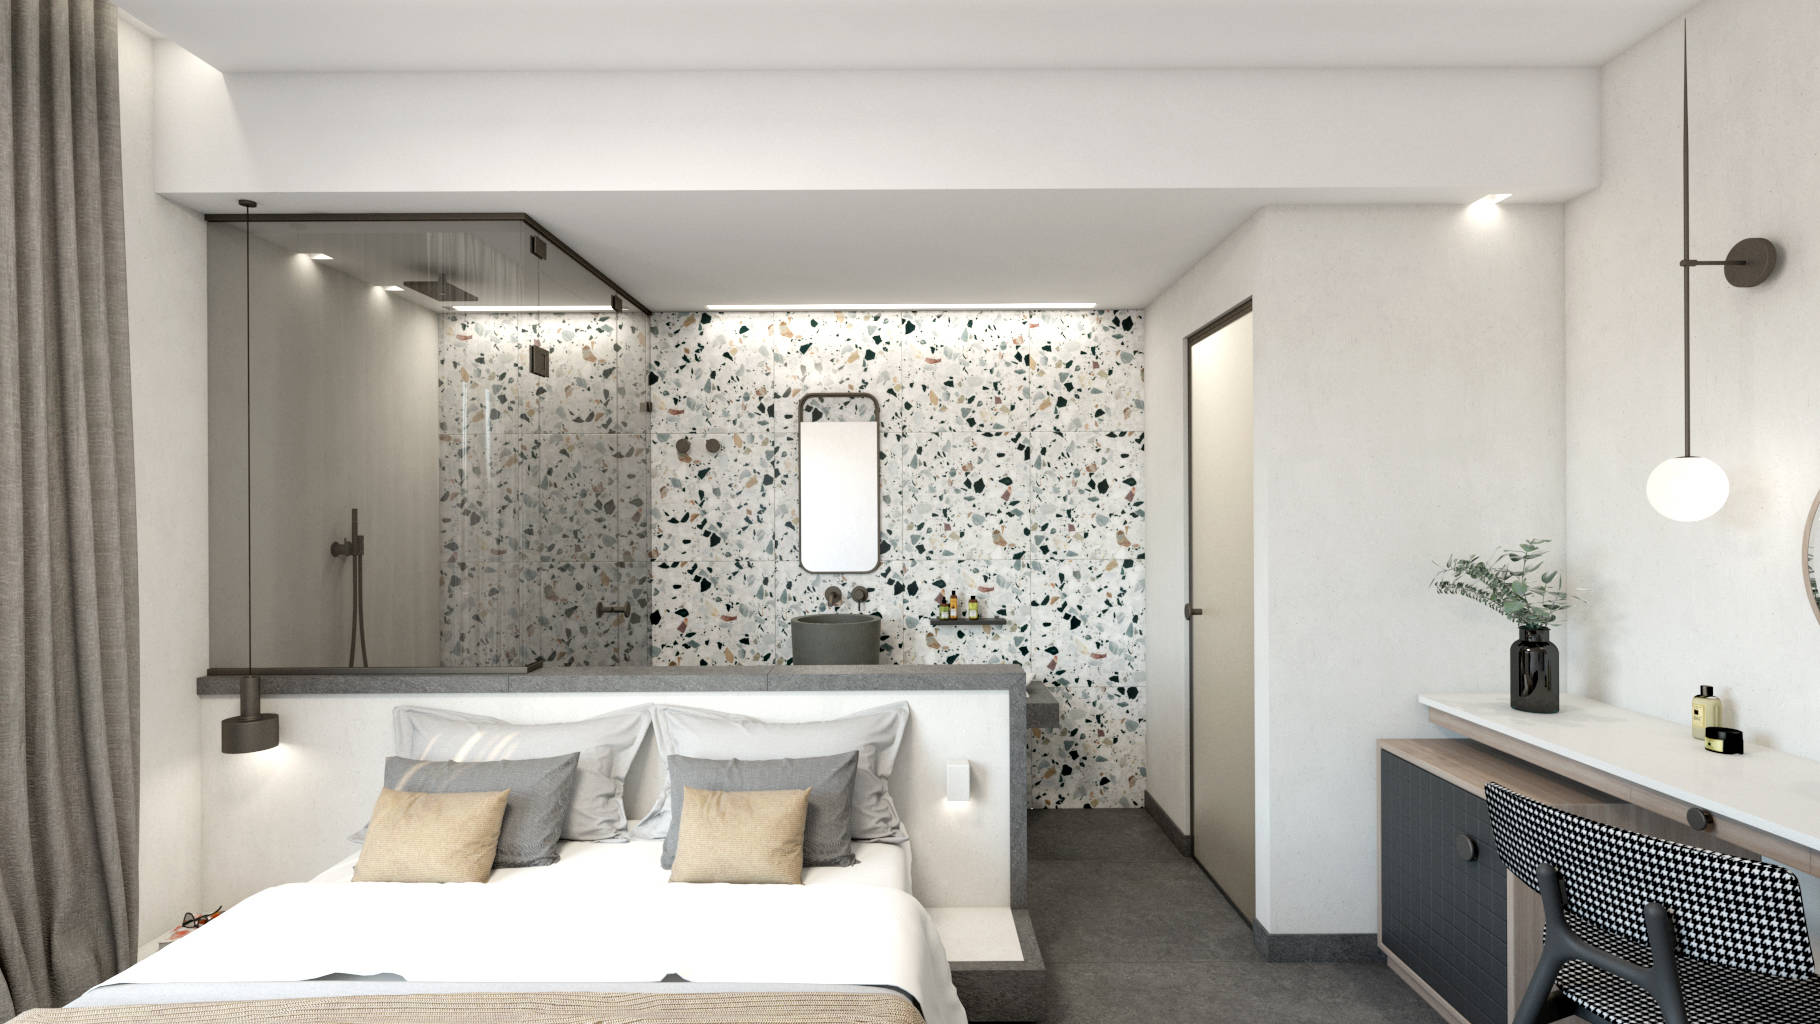 Double hotel room, interior design, bed and open bathroom. Δίκλινο δωμάτιο ξενοδοχείου, κρεβάτι και ανοιχτό μπάνιο.